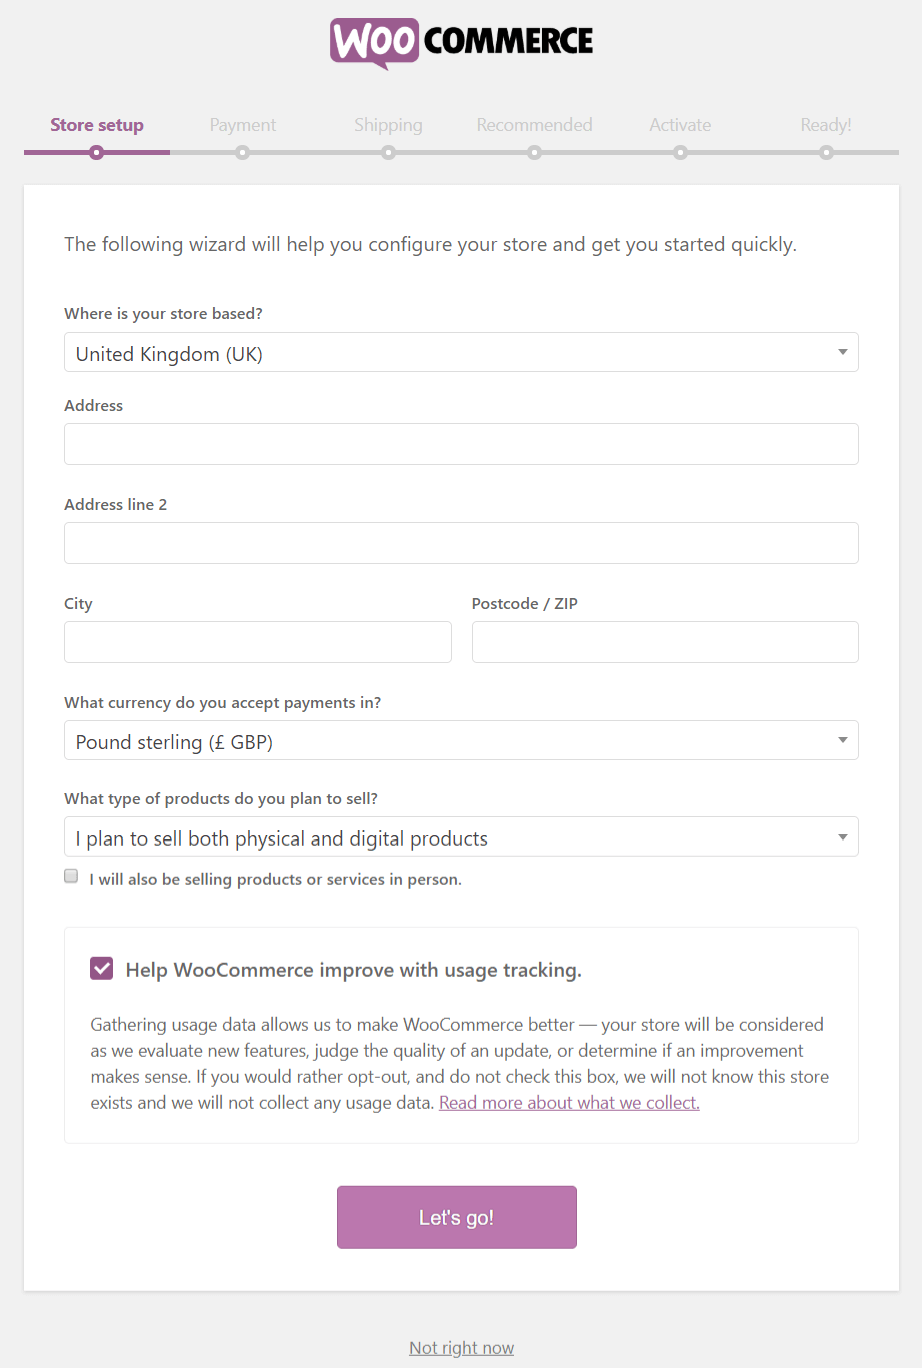 WooCommerce Setup Wizard - Step 1